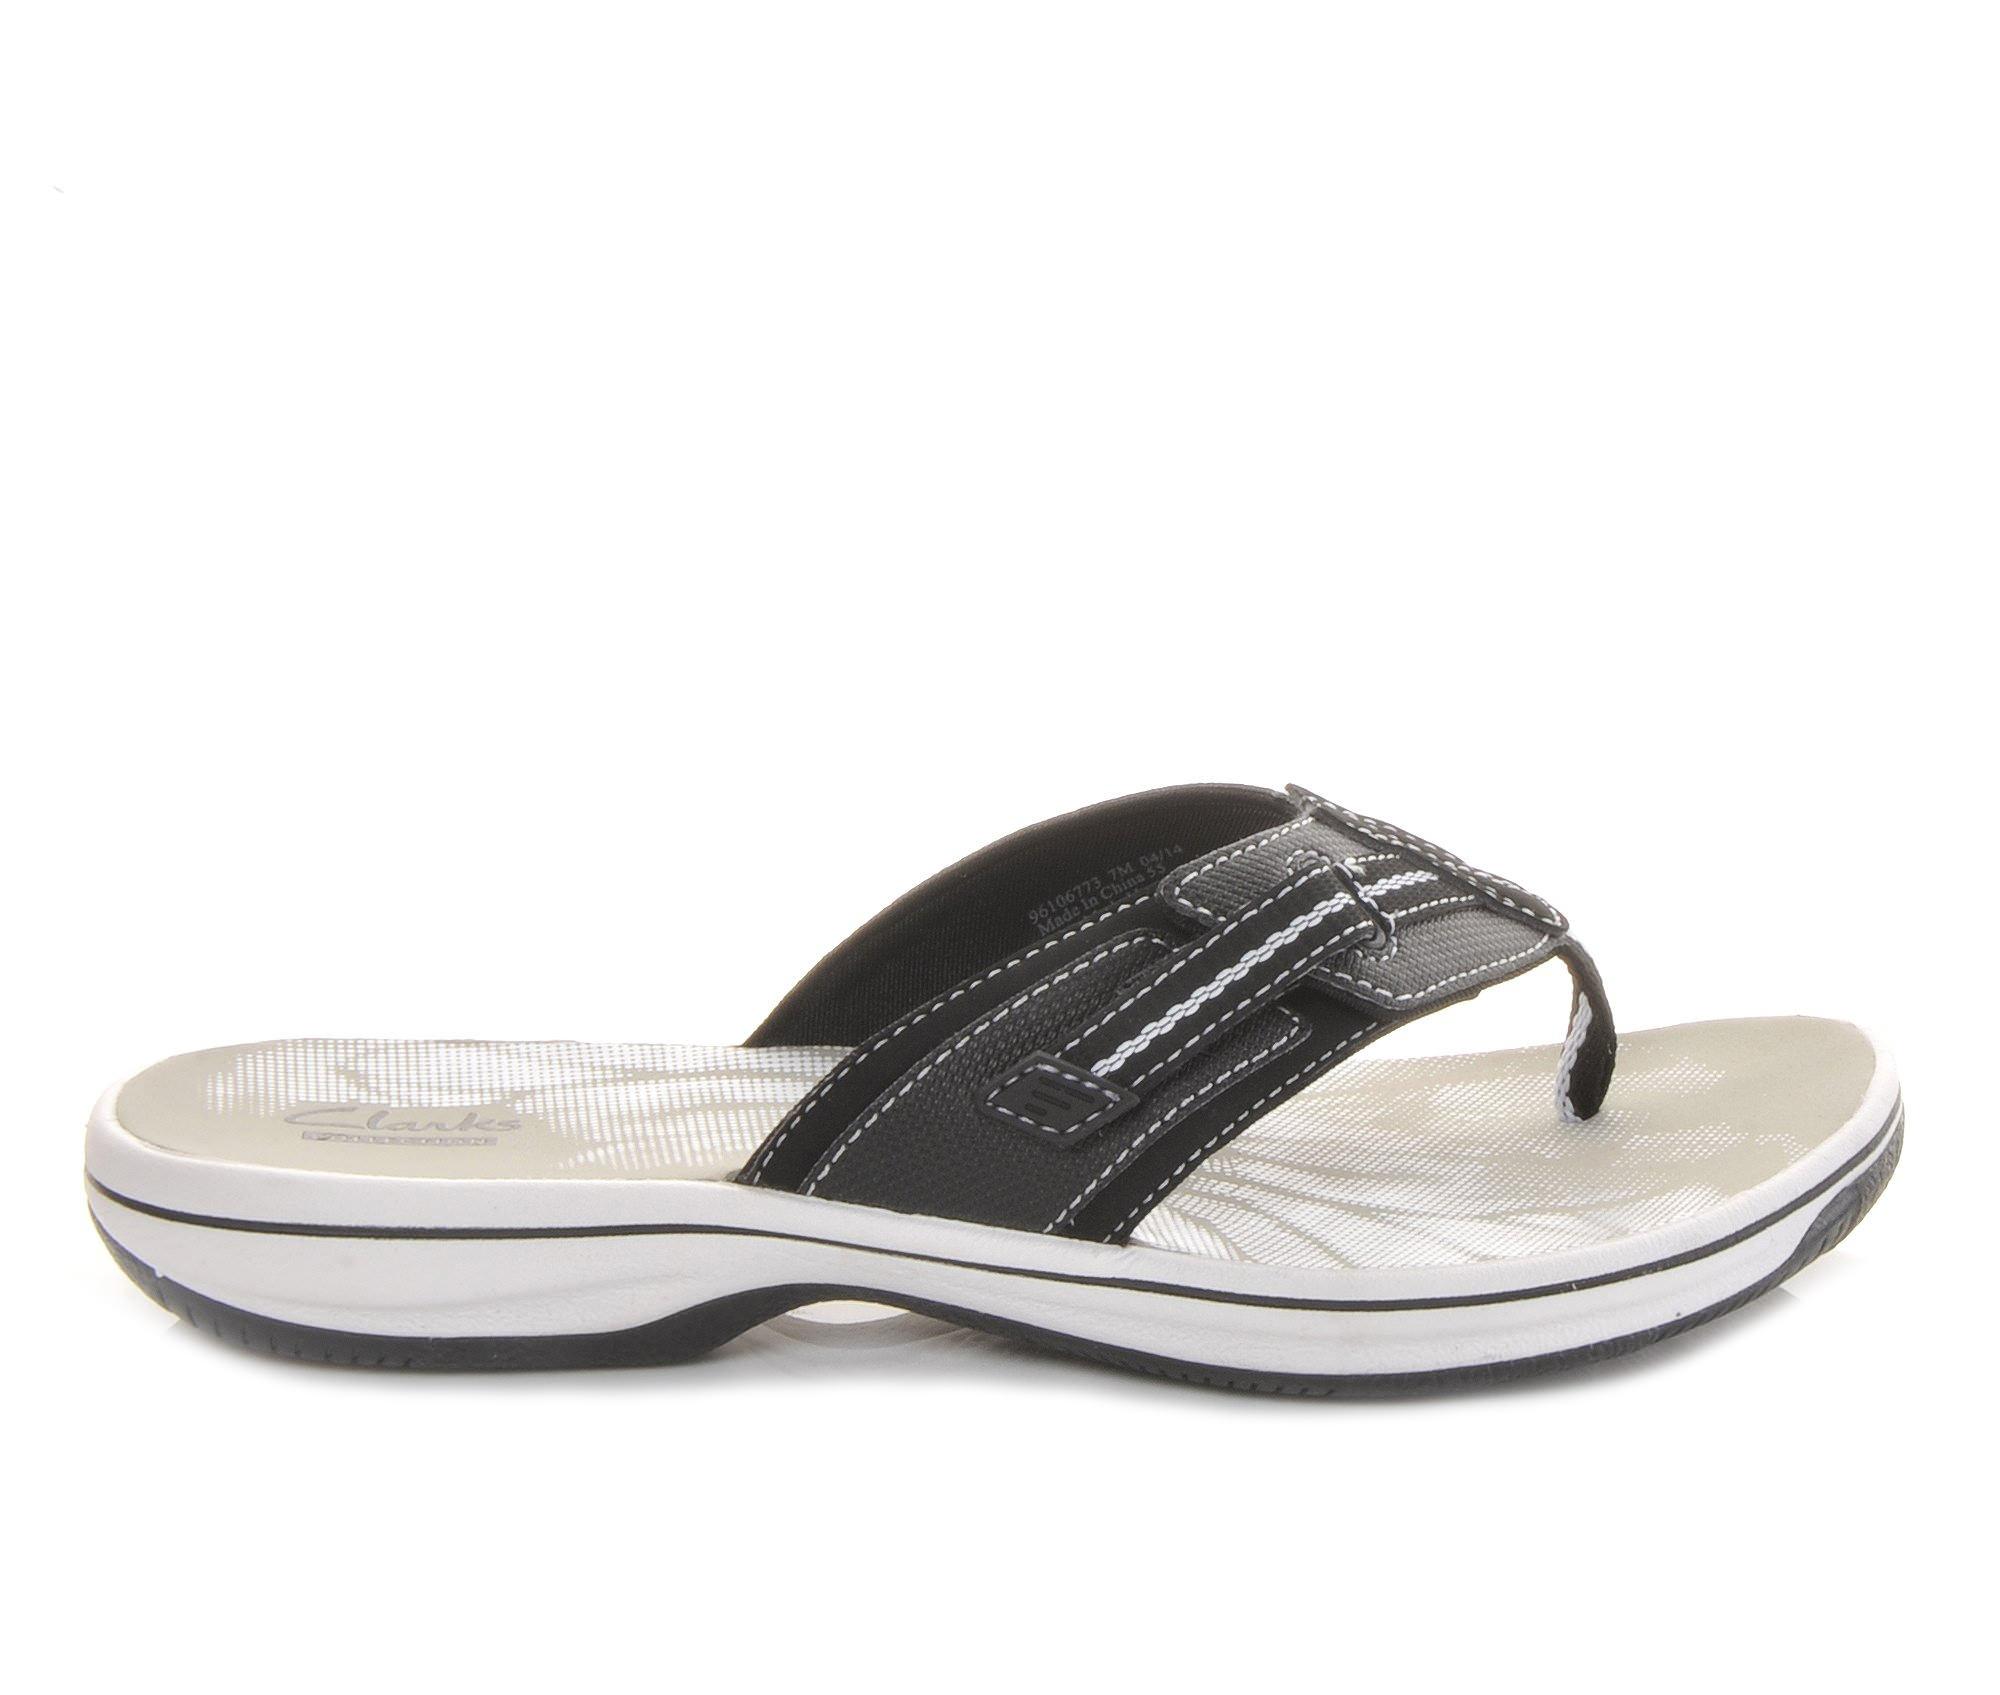 Women's Clarks Brinkley Jazz Sandals (Black)